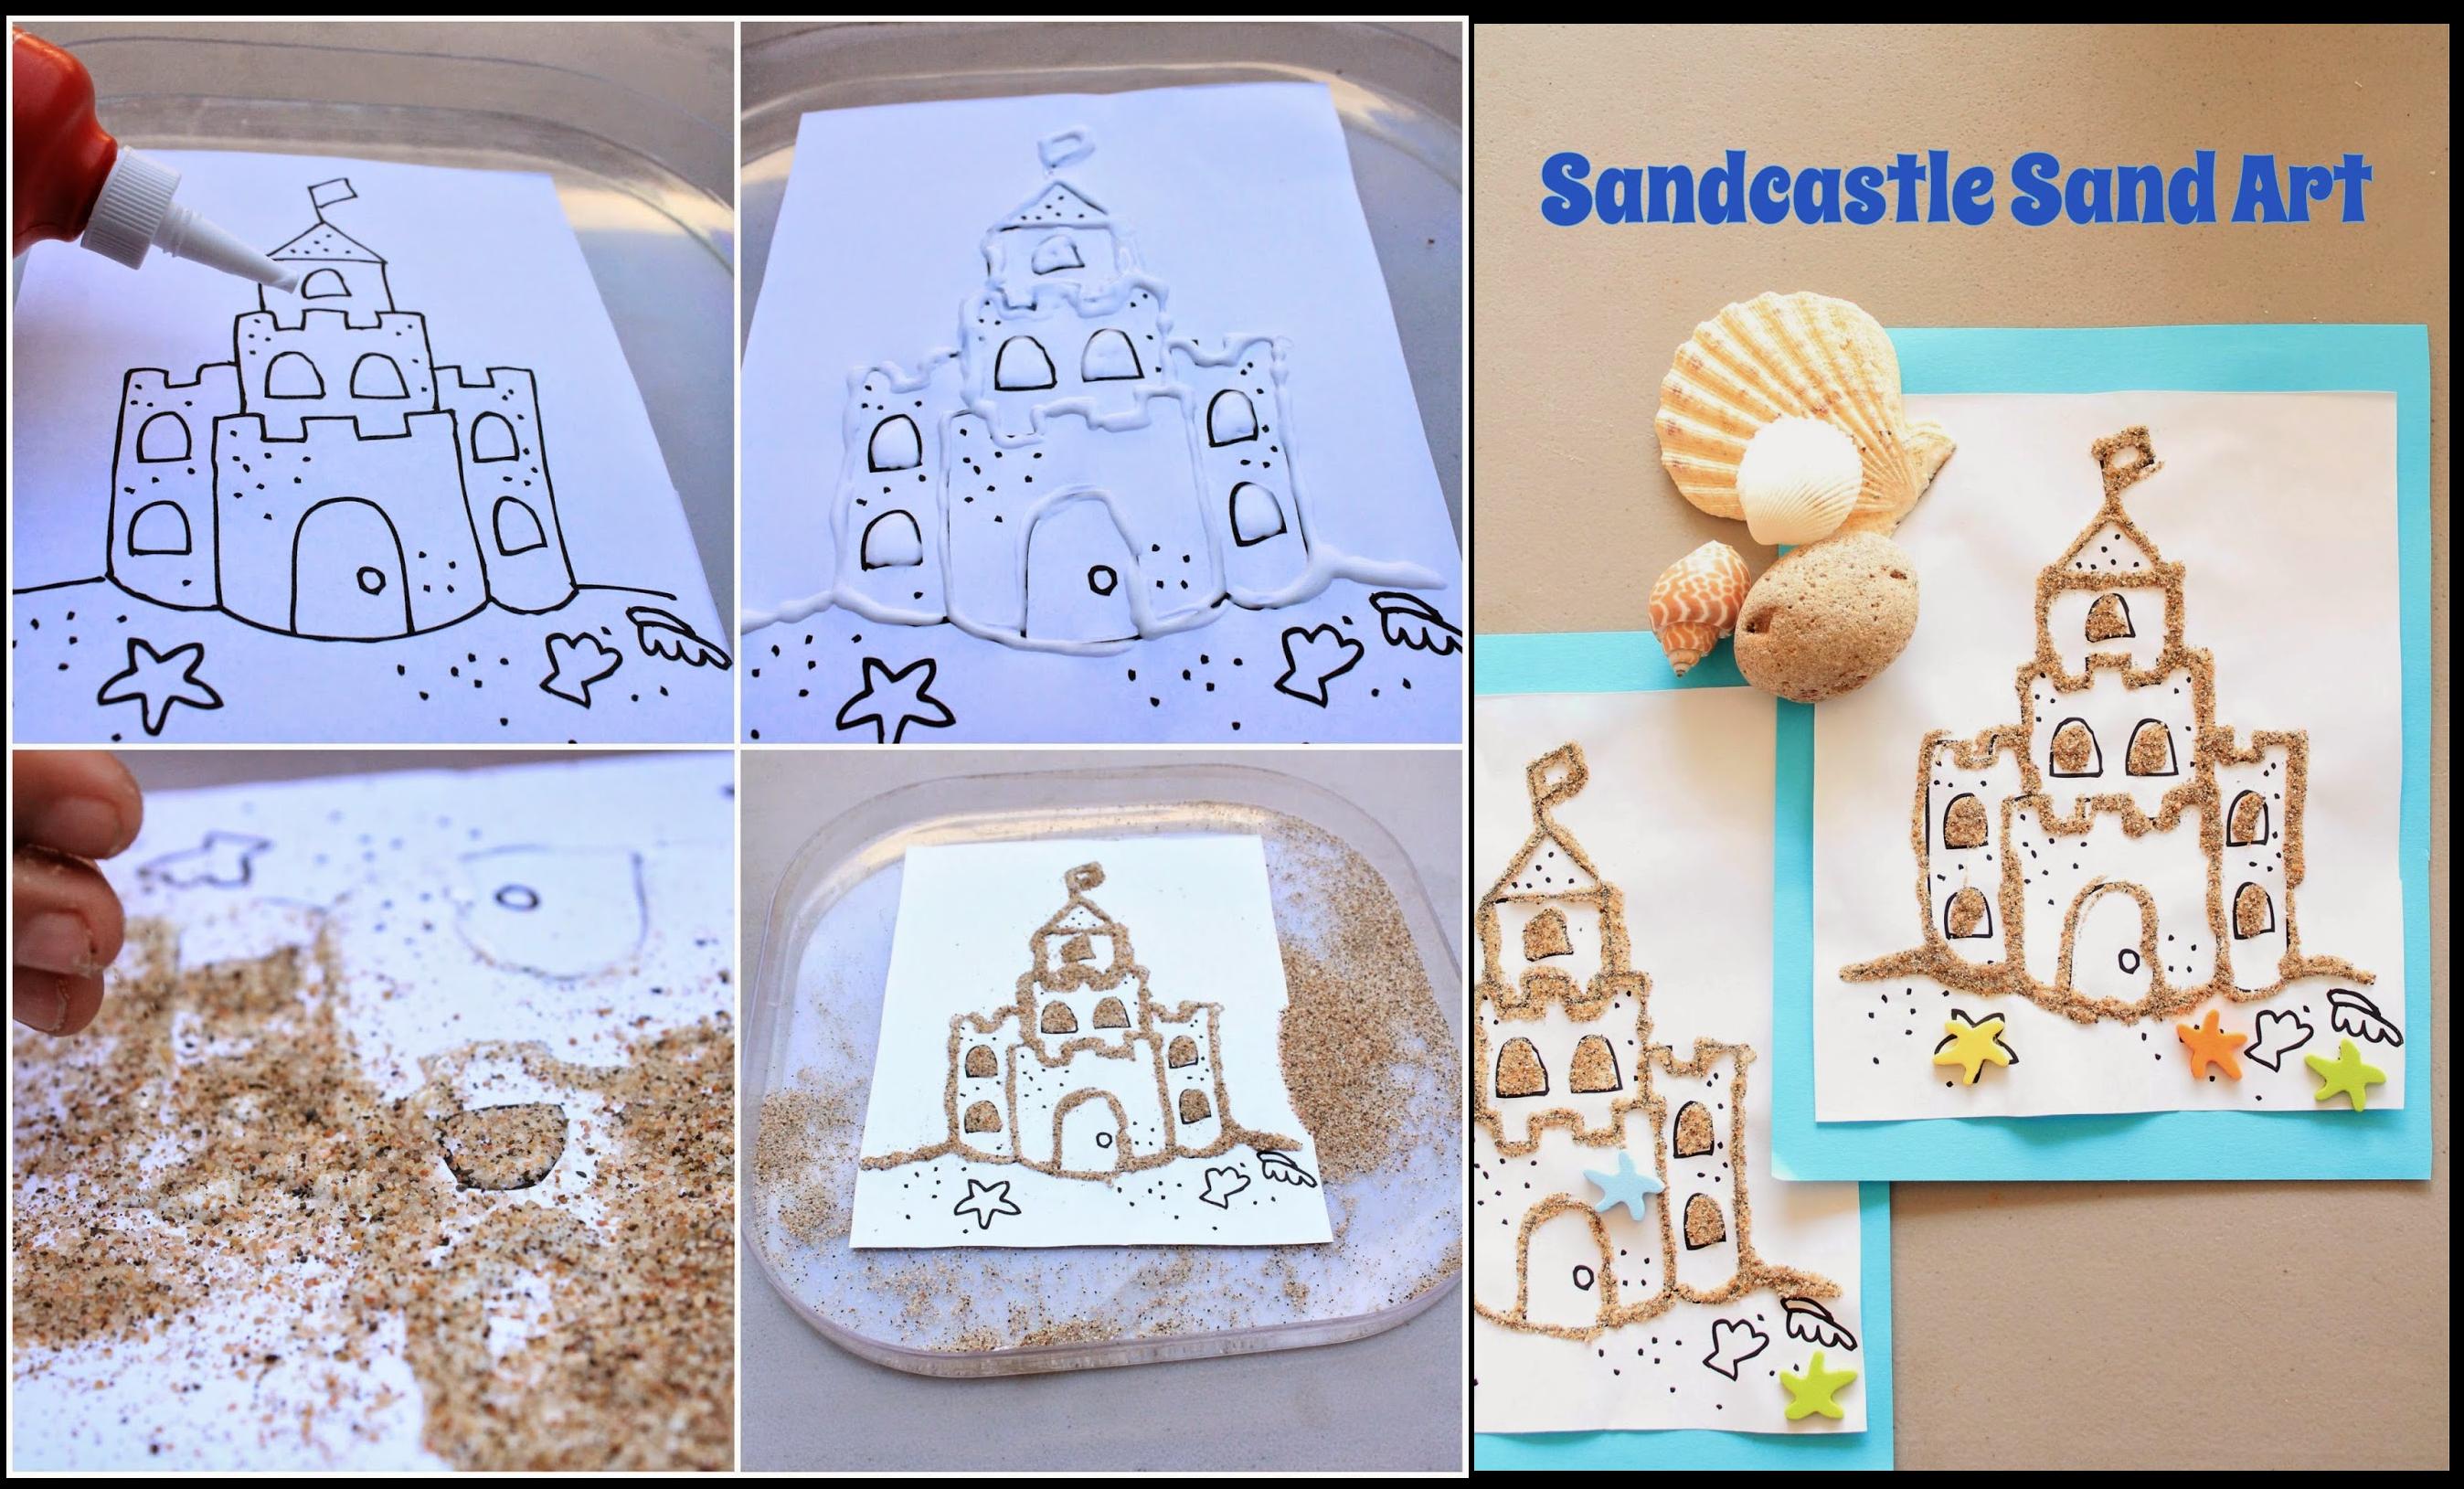 Sand Castle Sand Art